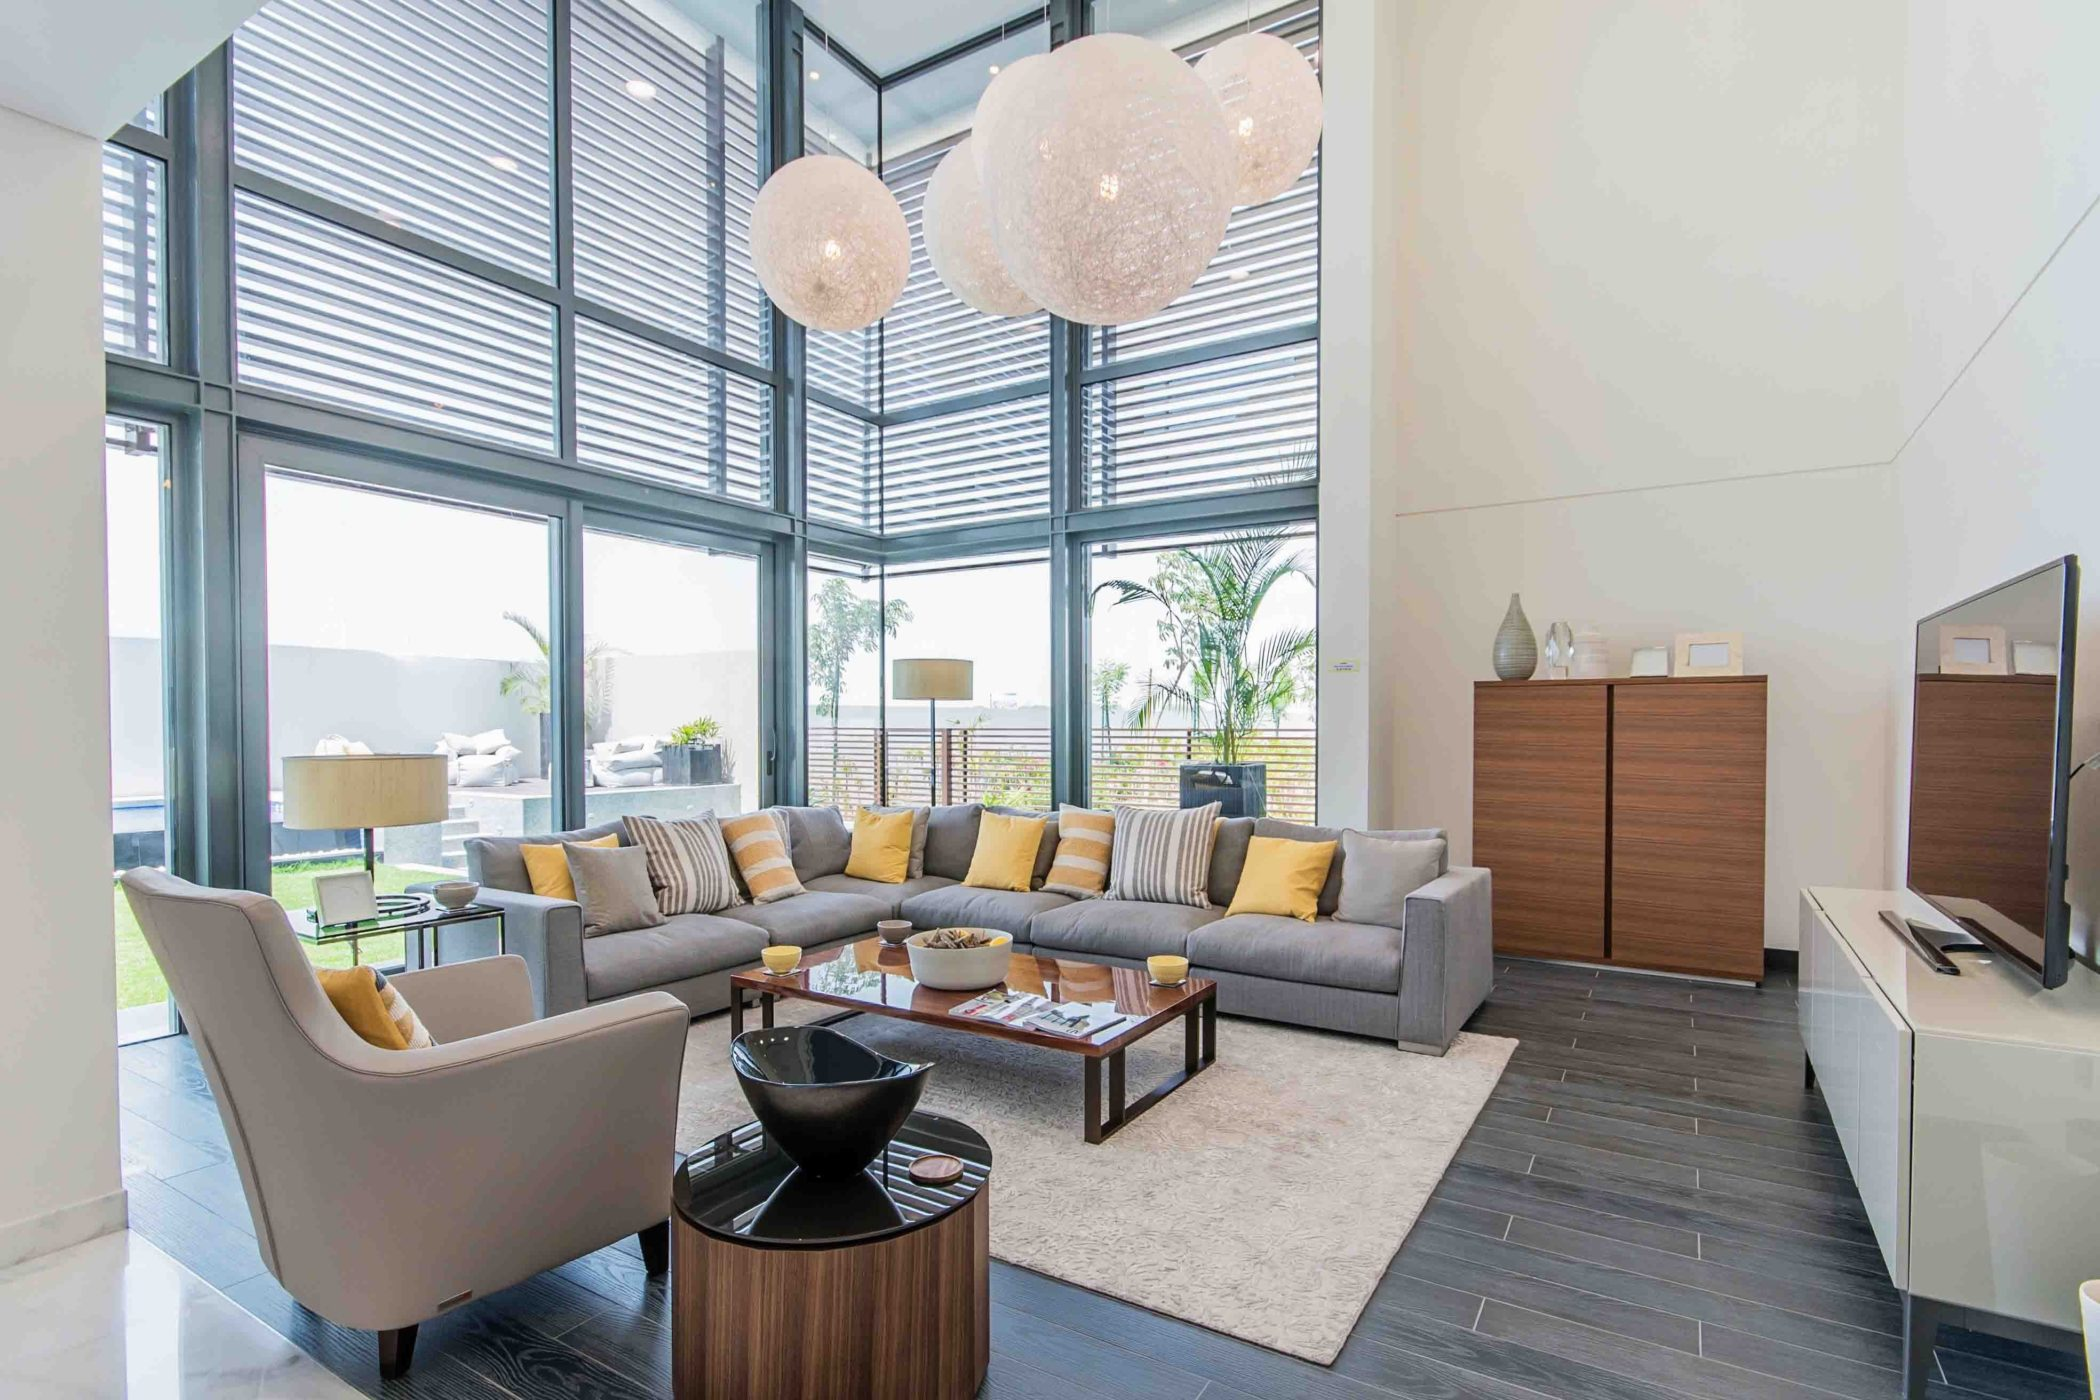 Gardenia Villas by Sobha in MBR City Sobha Hartland. Luxury apartments for sale in Dubai_6